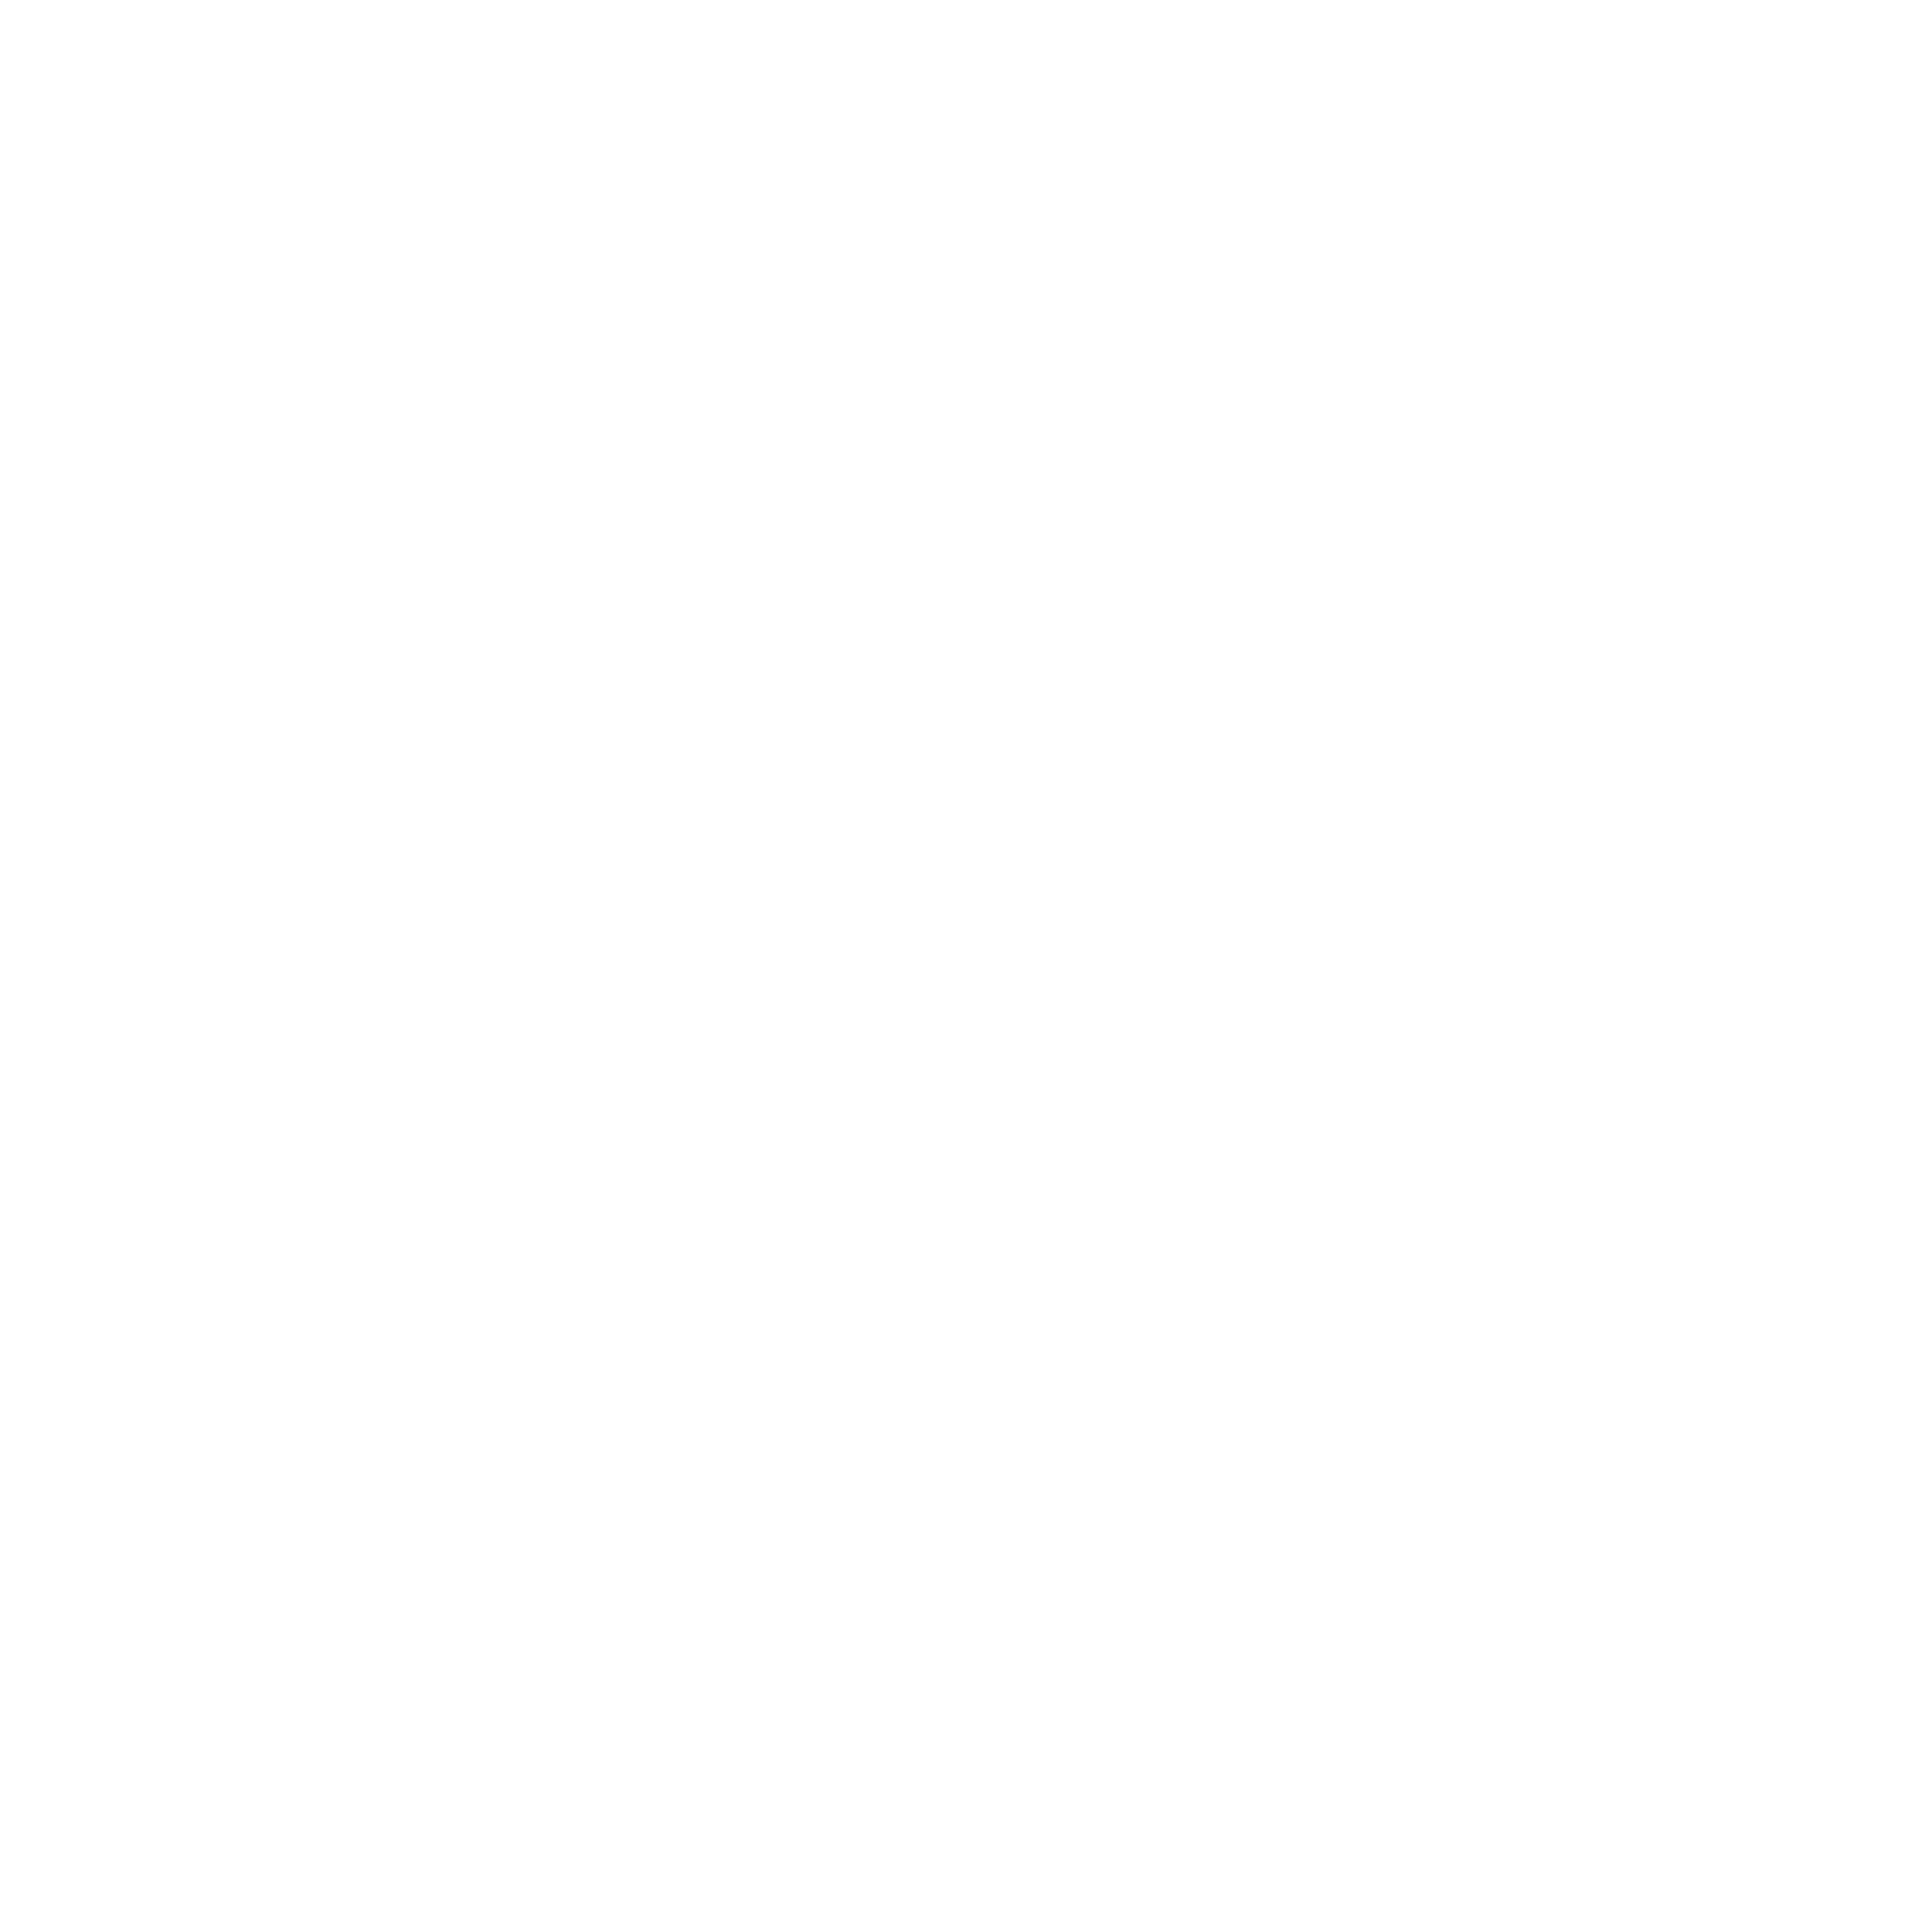 BIG Trucking Insurance